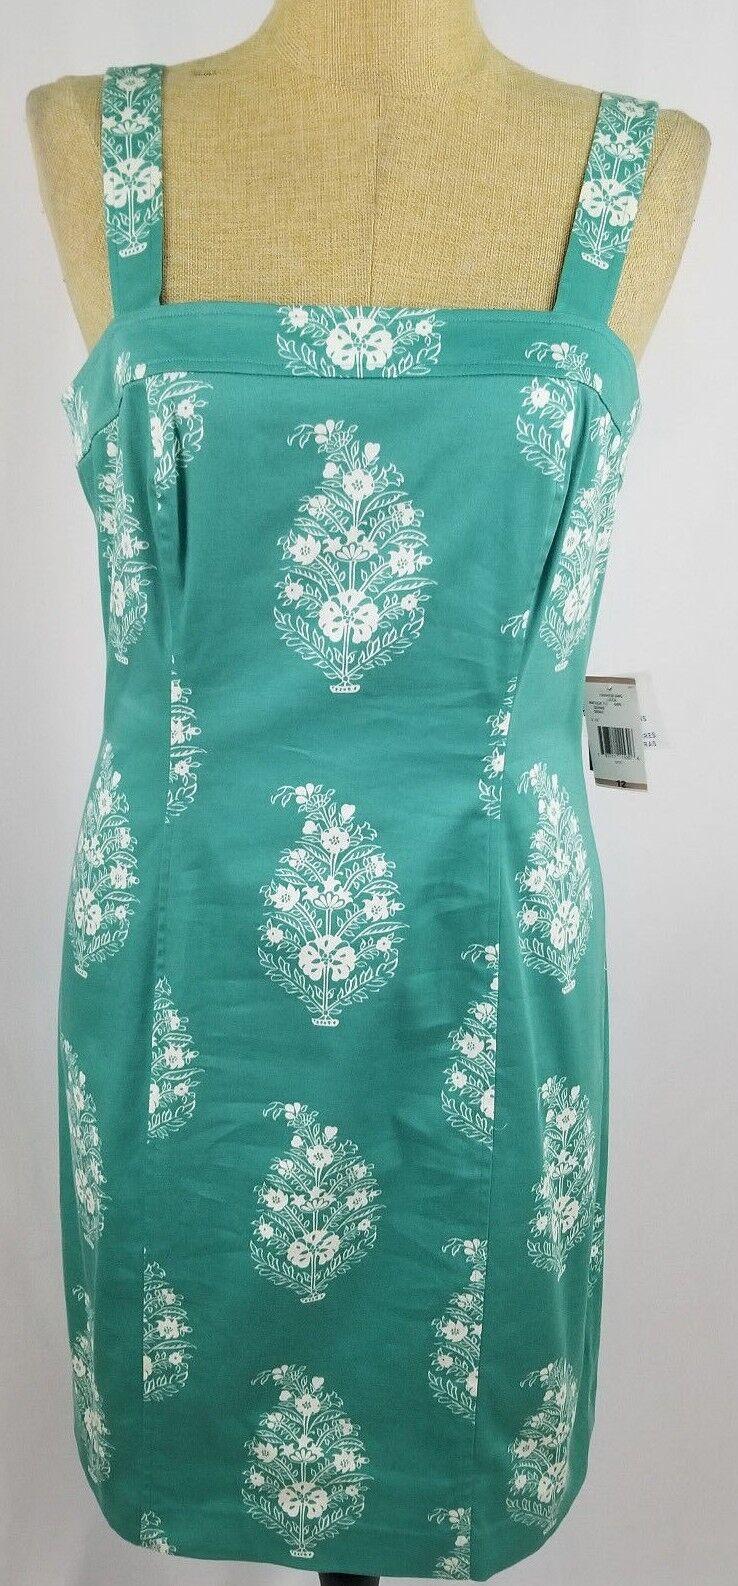 Jones New York Aqua Green Floral Sleeveless Dress Size 12 Sundress Unlined NWT